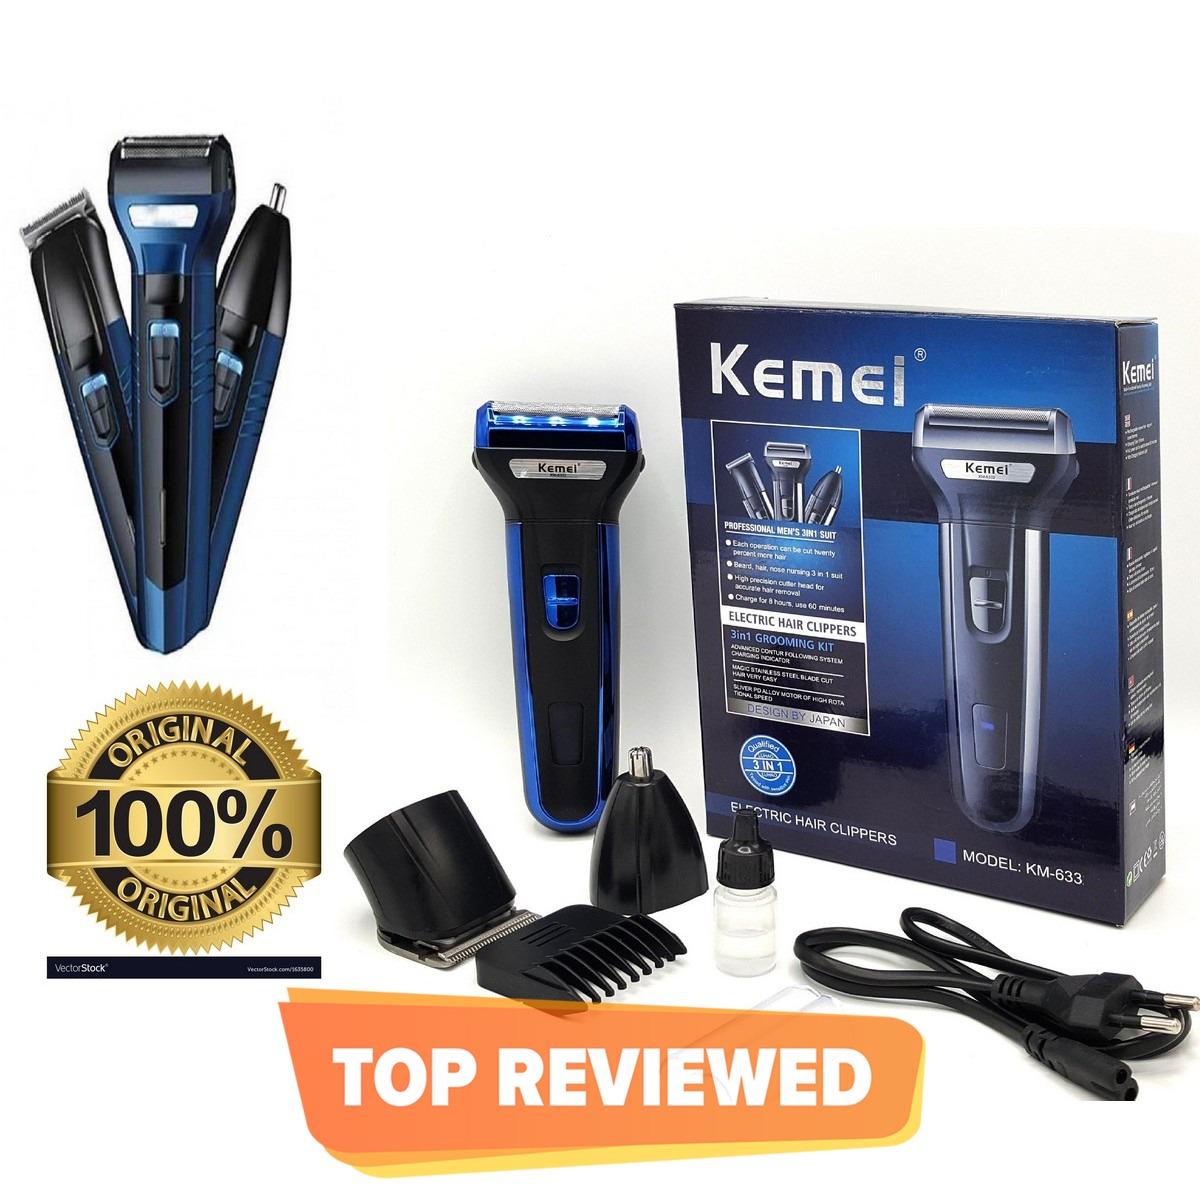 Original Kemei 6330 3 In 1 Rechargeable Hair Clipper kemei Km-6330 Kemei km-6330 Hair Clipper Razor Shaver Nose Trimmer 3 in 1 beard styling for men Rechargeable Hair Removal machine KM 6330 Guaranted Original Quality kemei 6330 kemei 3 in 1 kemei km 6330